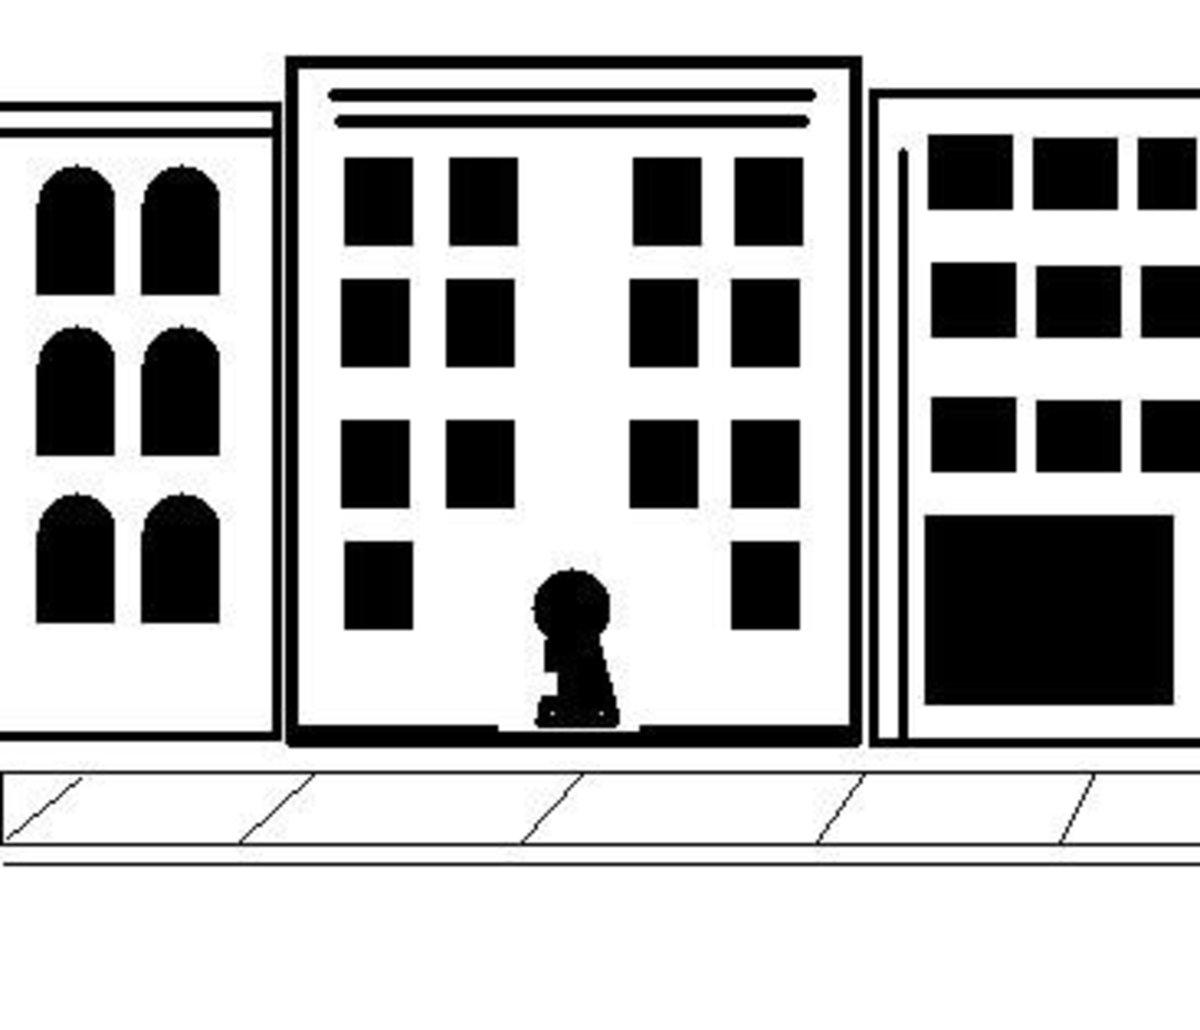 apartment-and-condo-security-basics